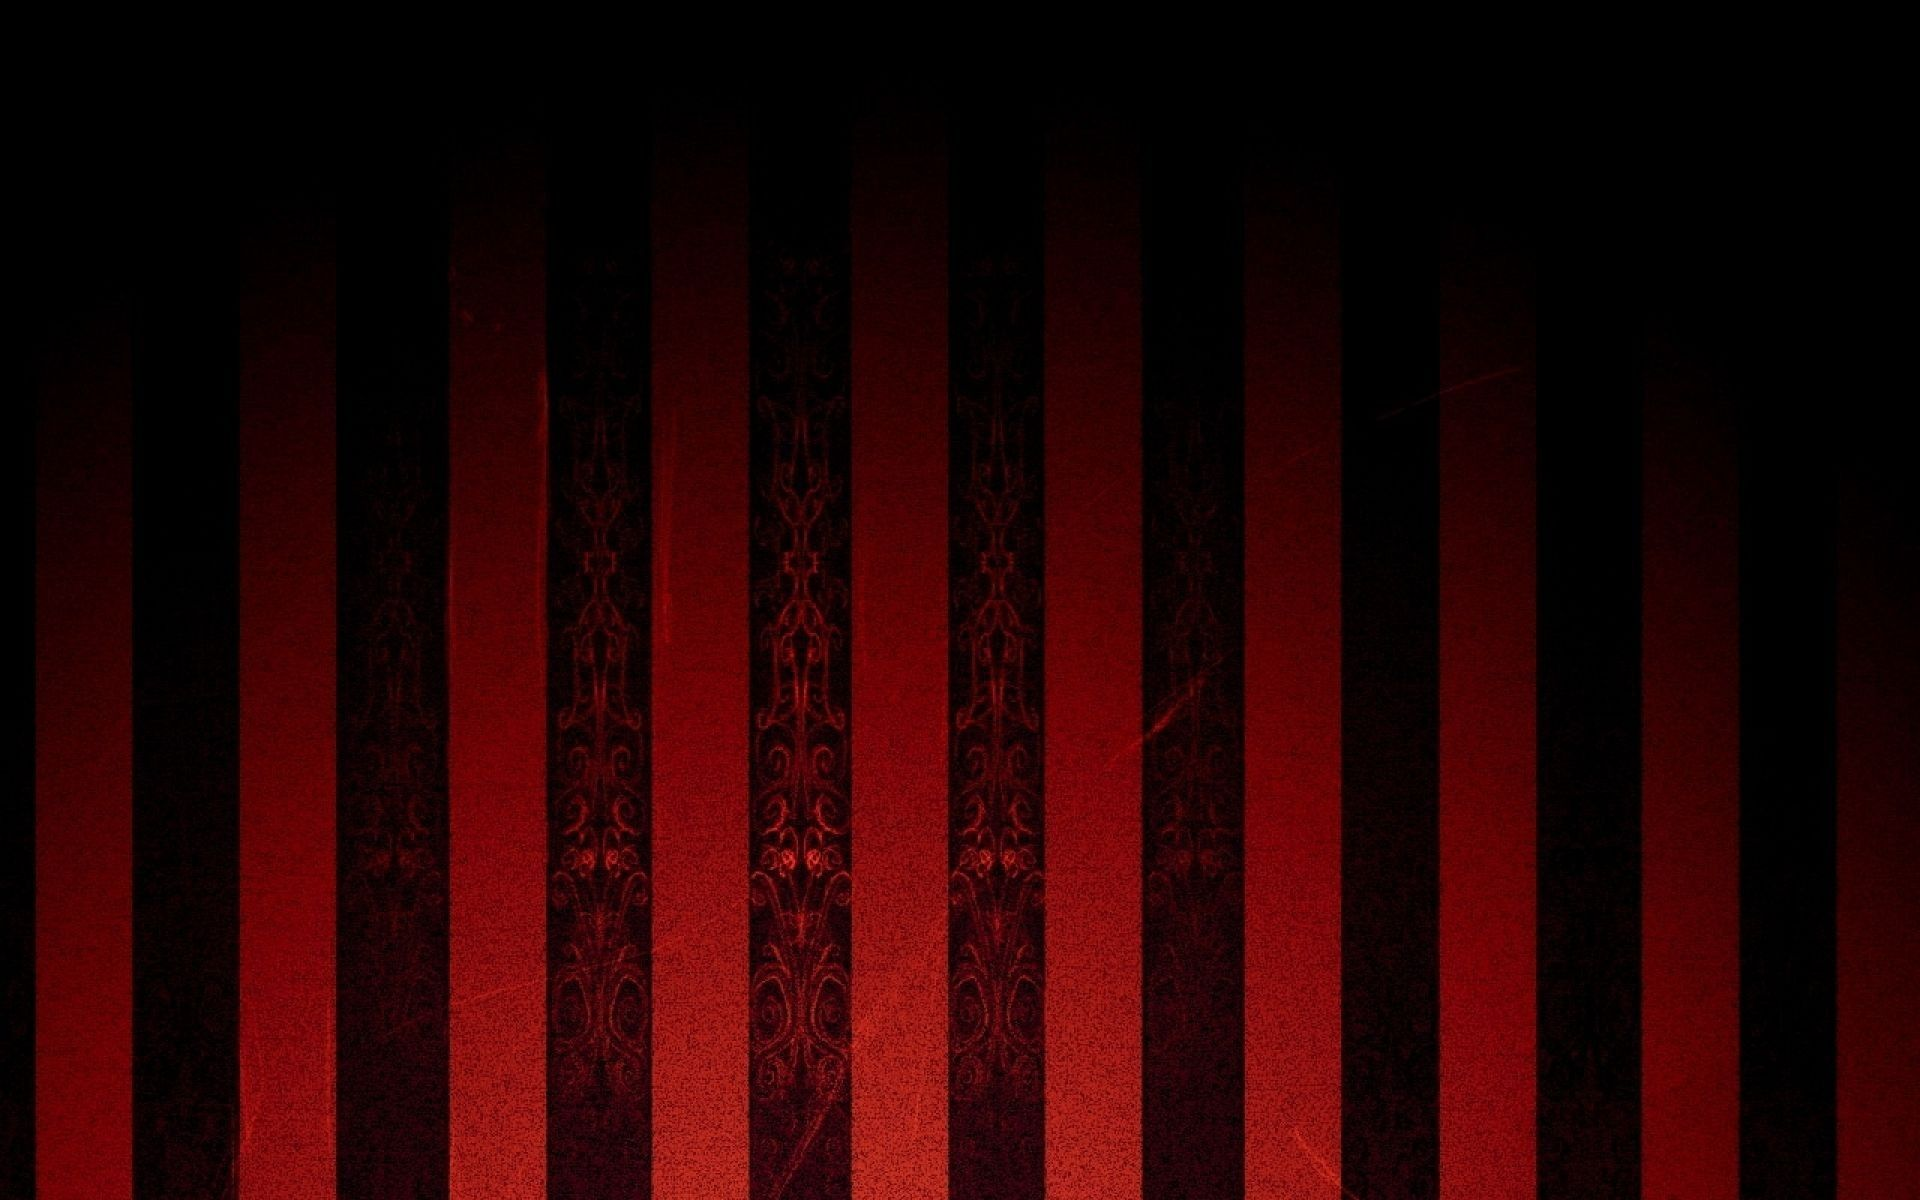 Beautiful Cool Red Desktop Backgrounds